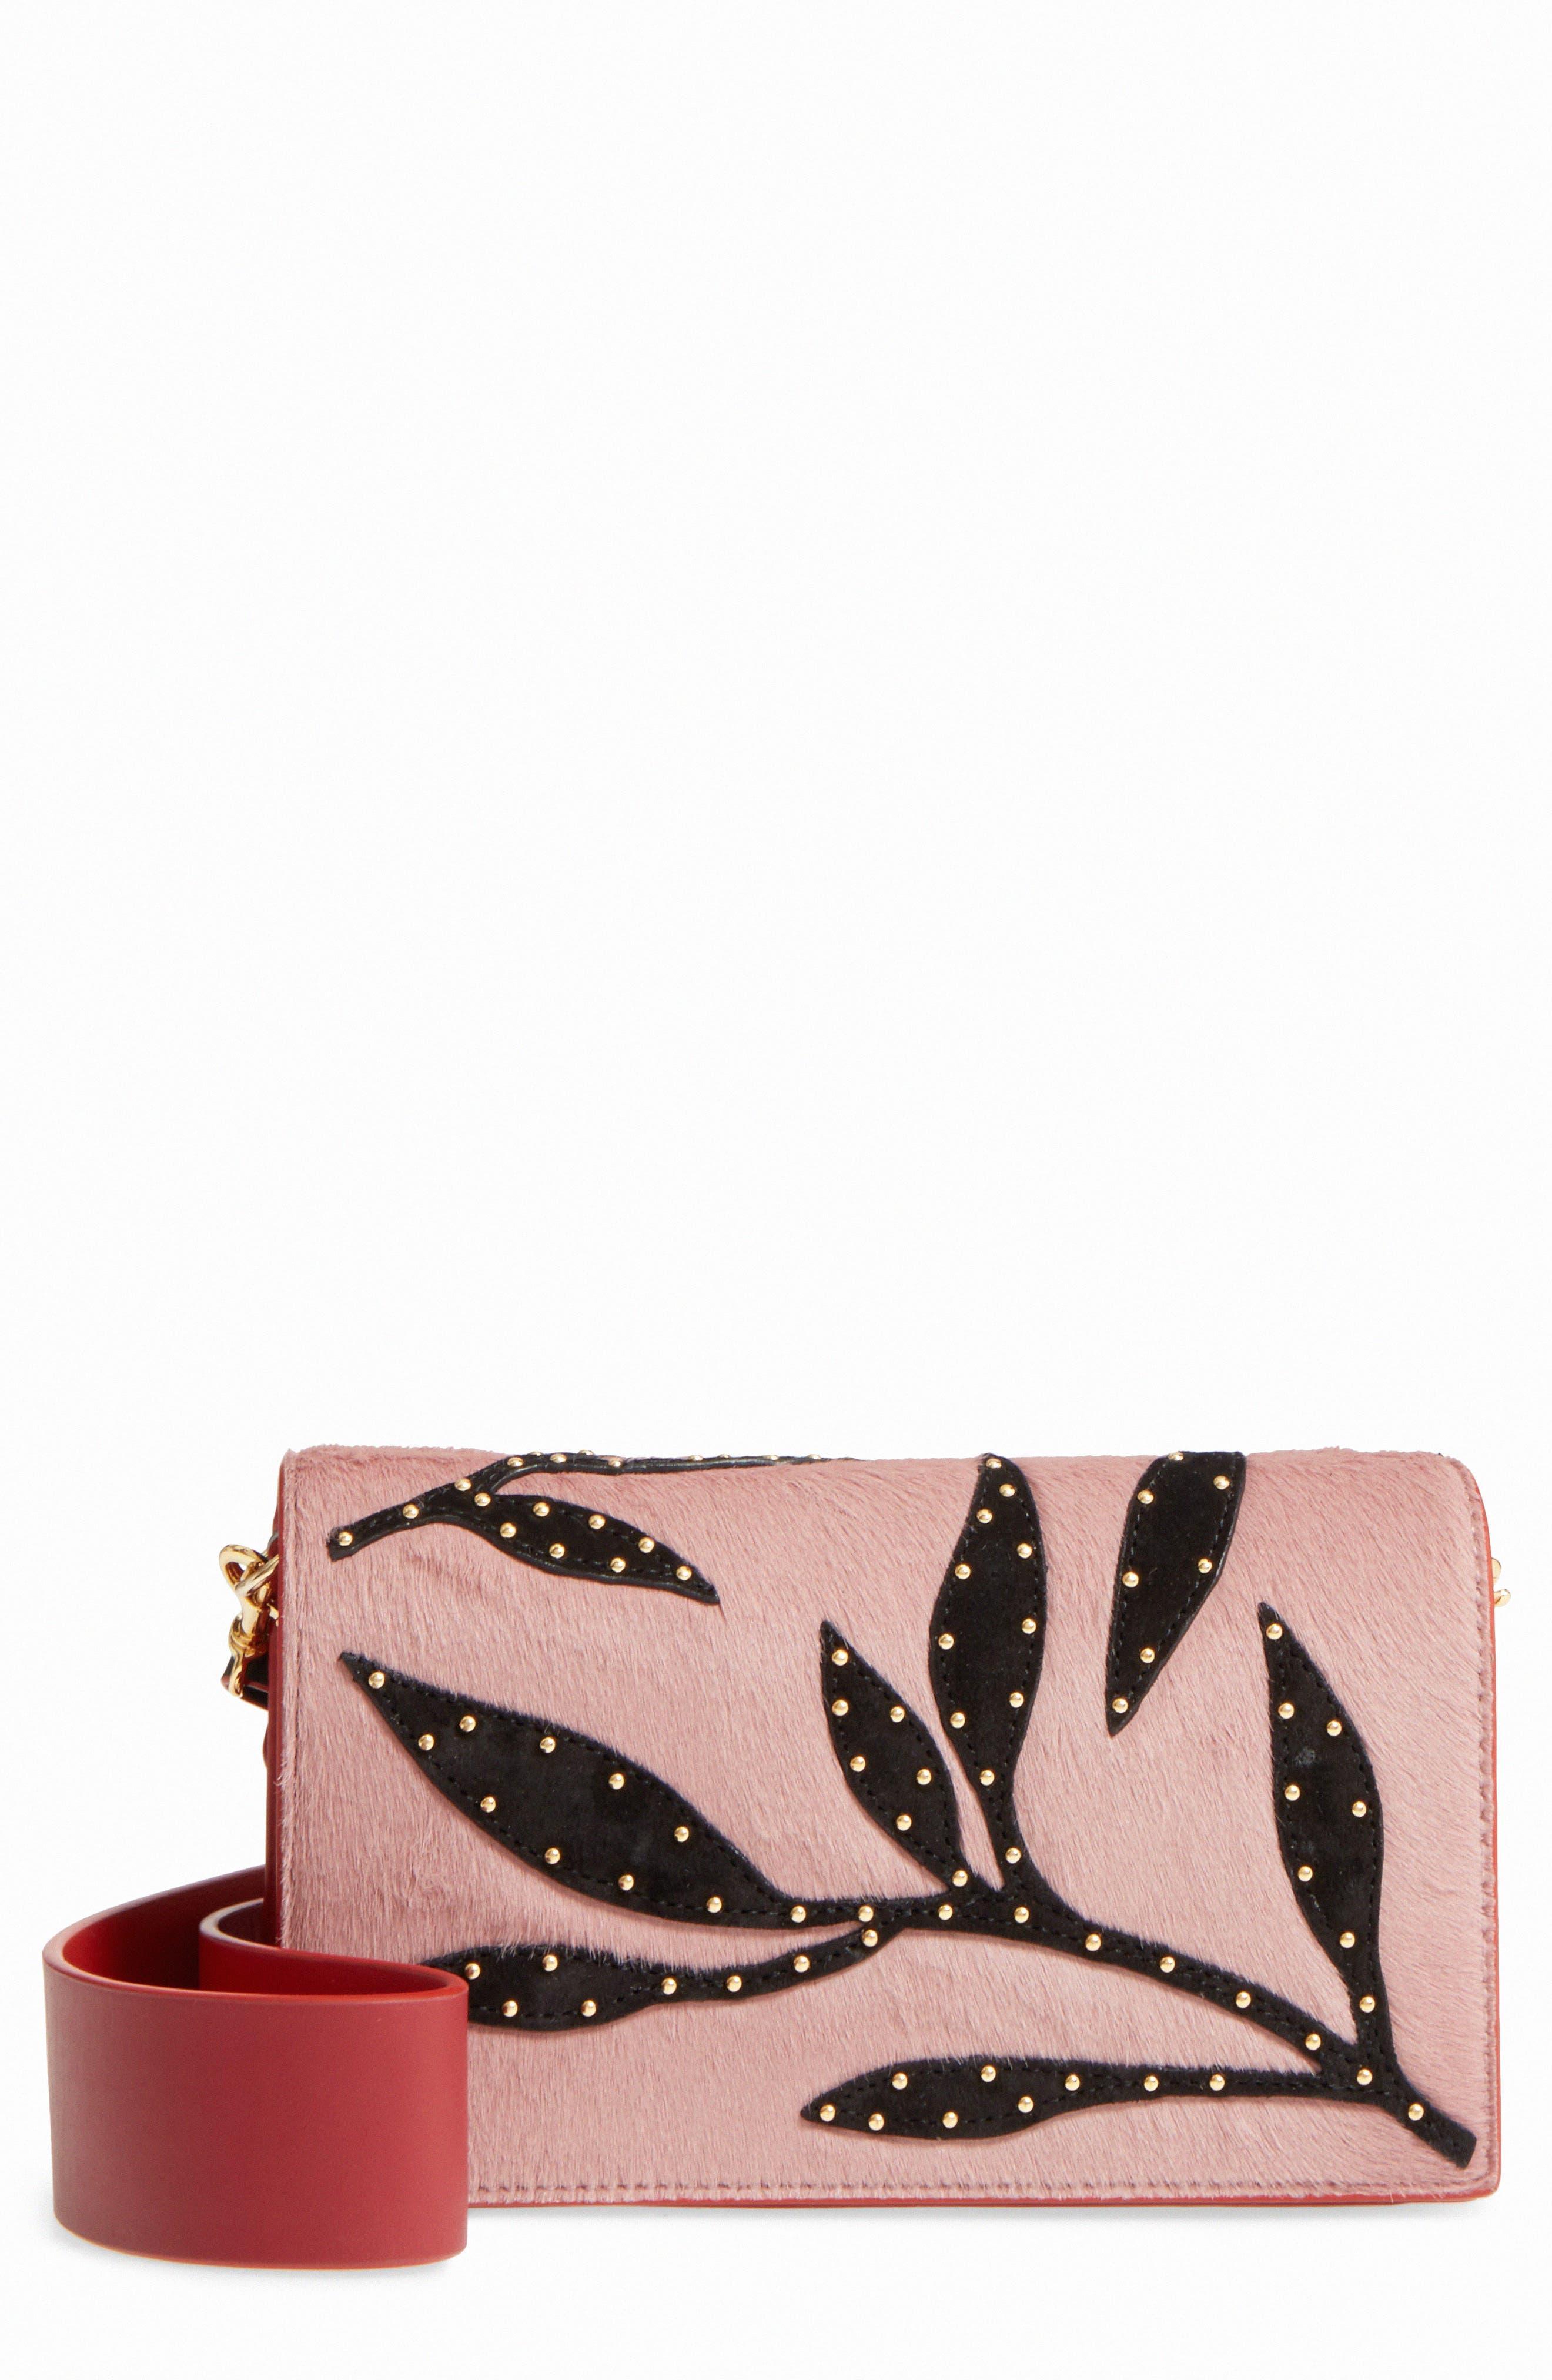 Diane von Furstenberg Soirée Genuine Calf Hair & Leather Convertible Shoulder Bag